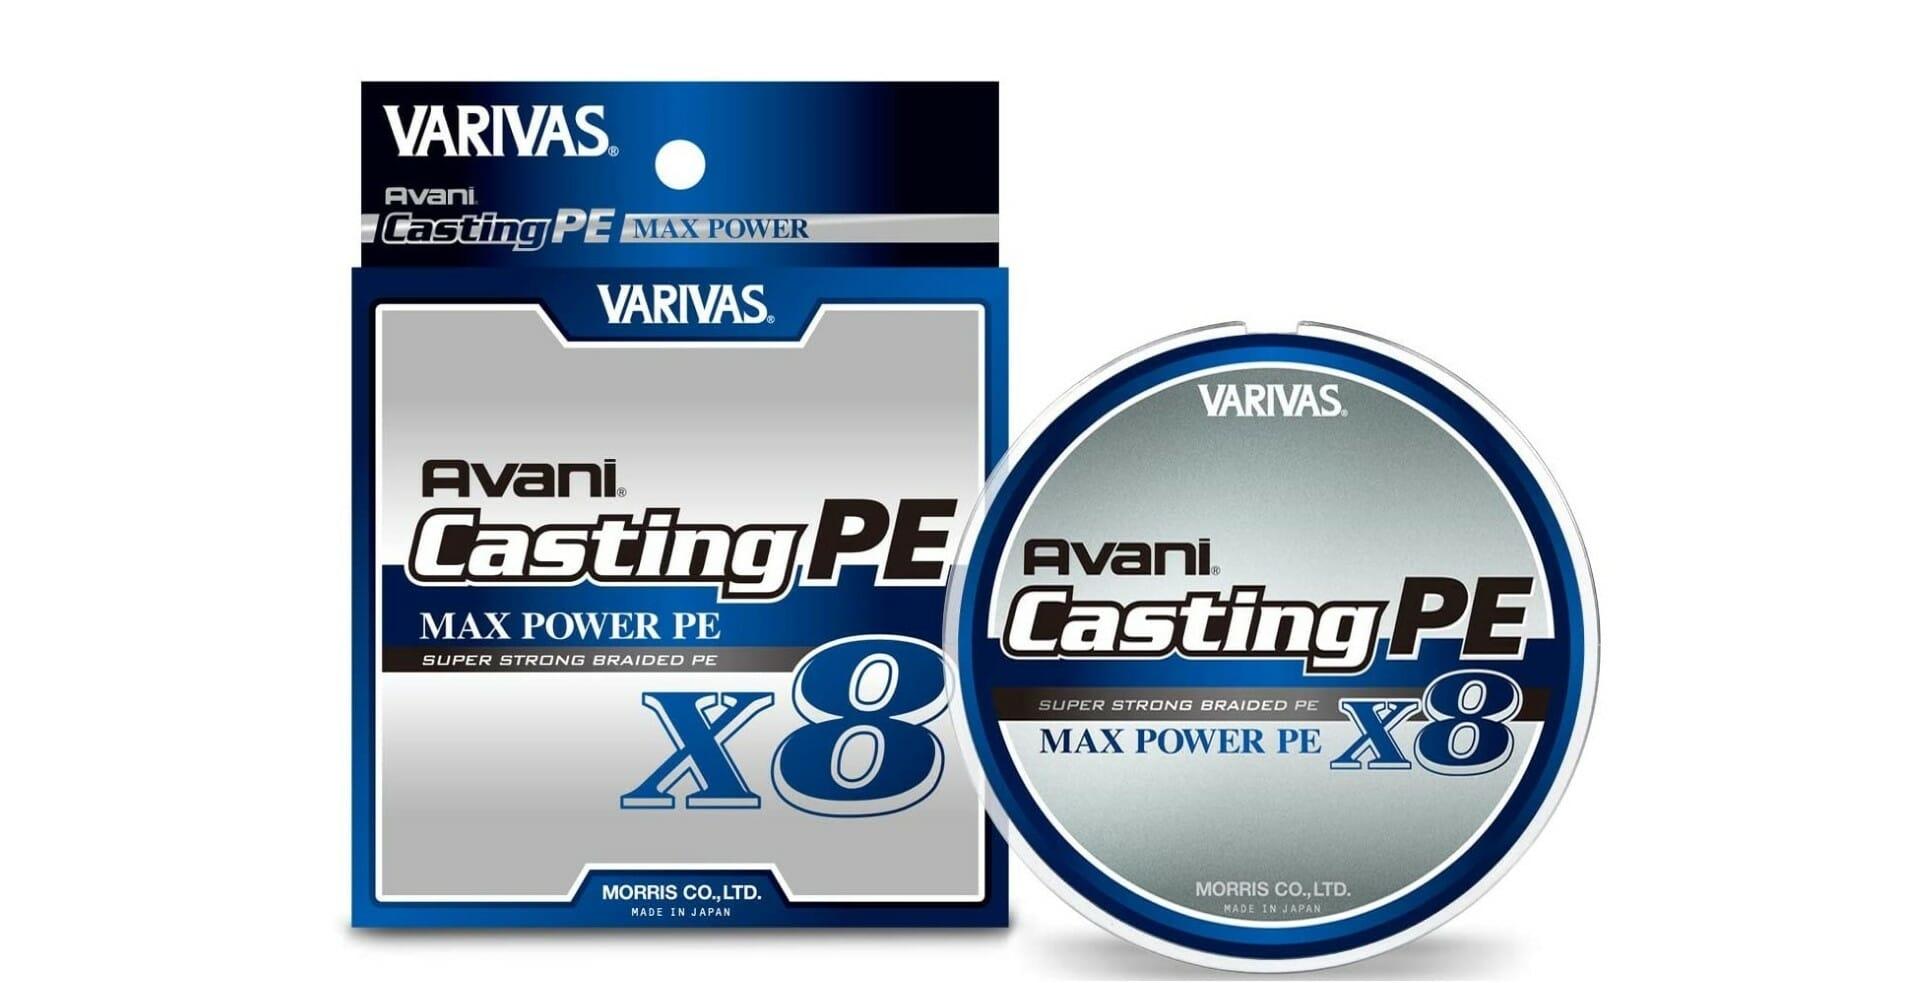 Varivas Avani Max Casting PE x8 4fishing filo pesca